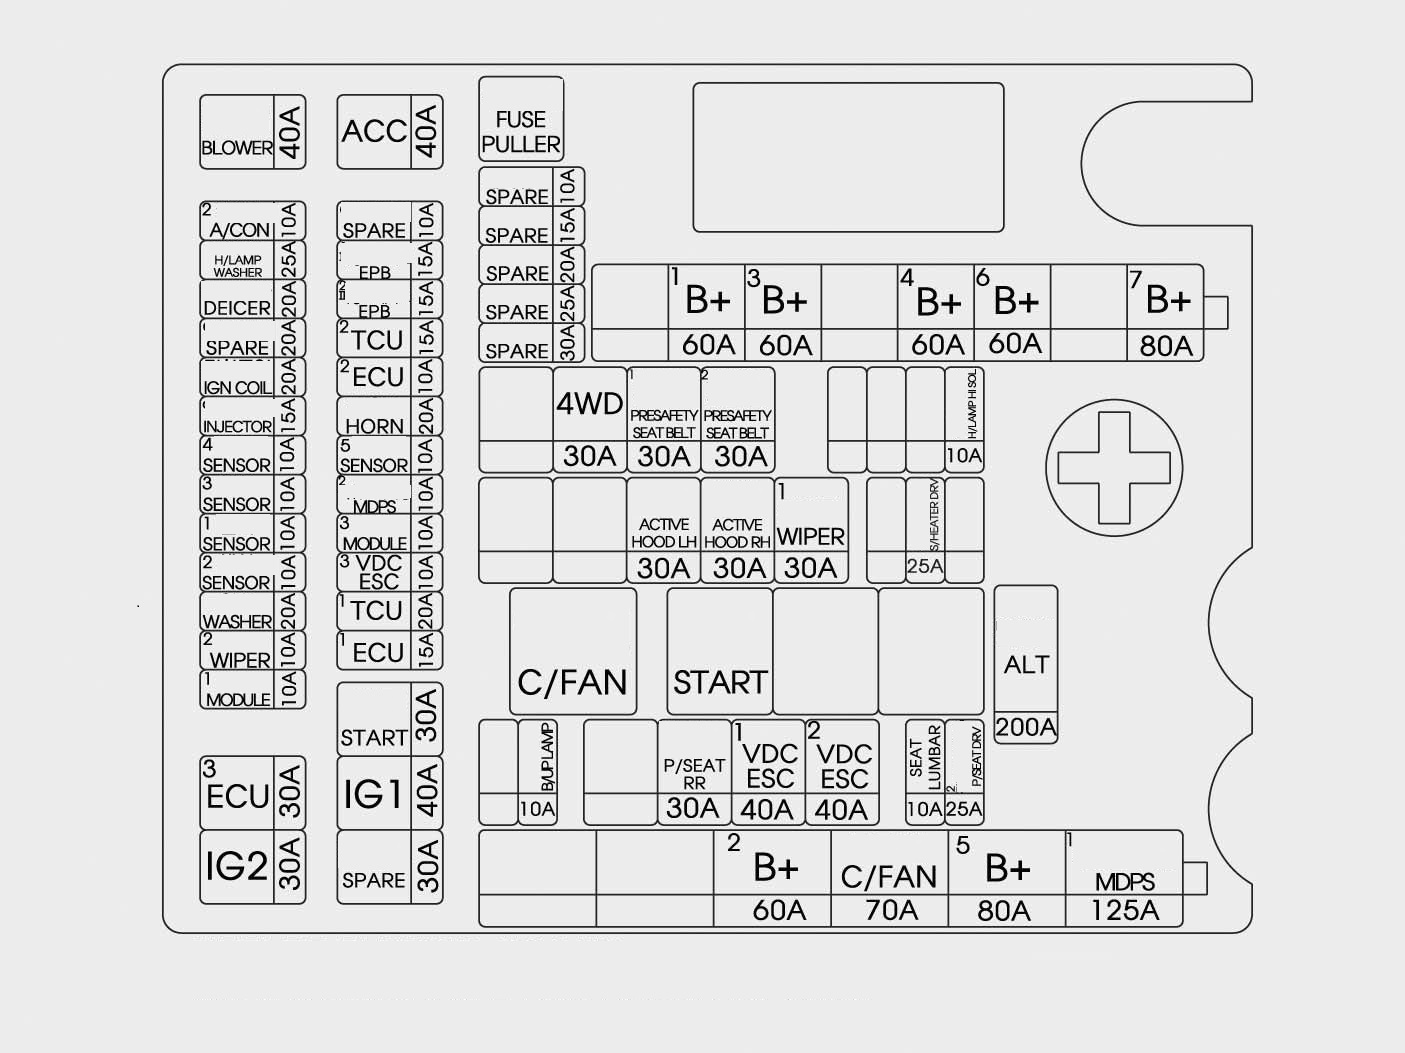 Hyundai Genesis Fuse Box Diagram Manual Guide Wiring 2005 Elantra 2013 Harness Library Rh 45 Codingcommunity De 2012 Location